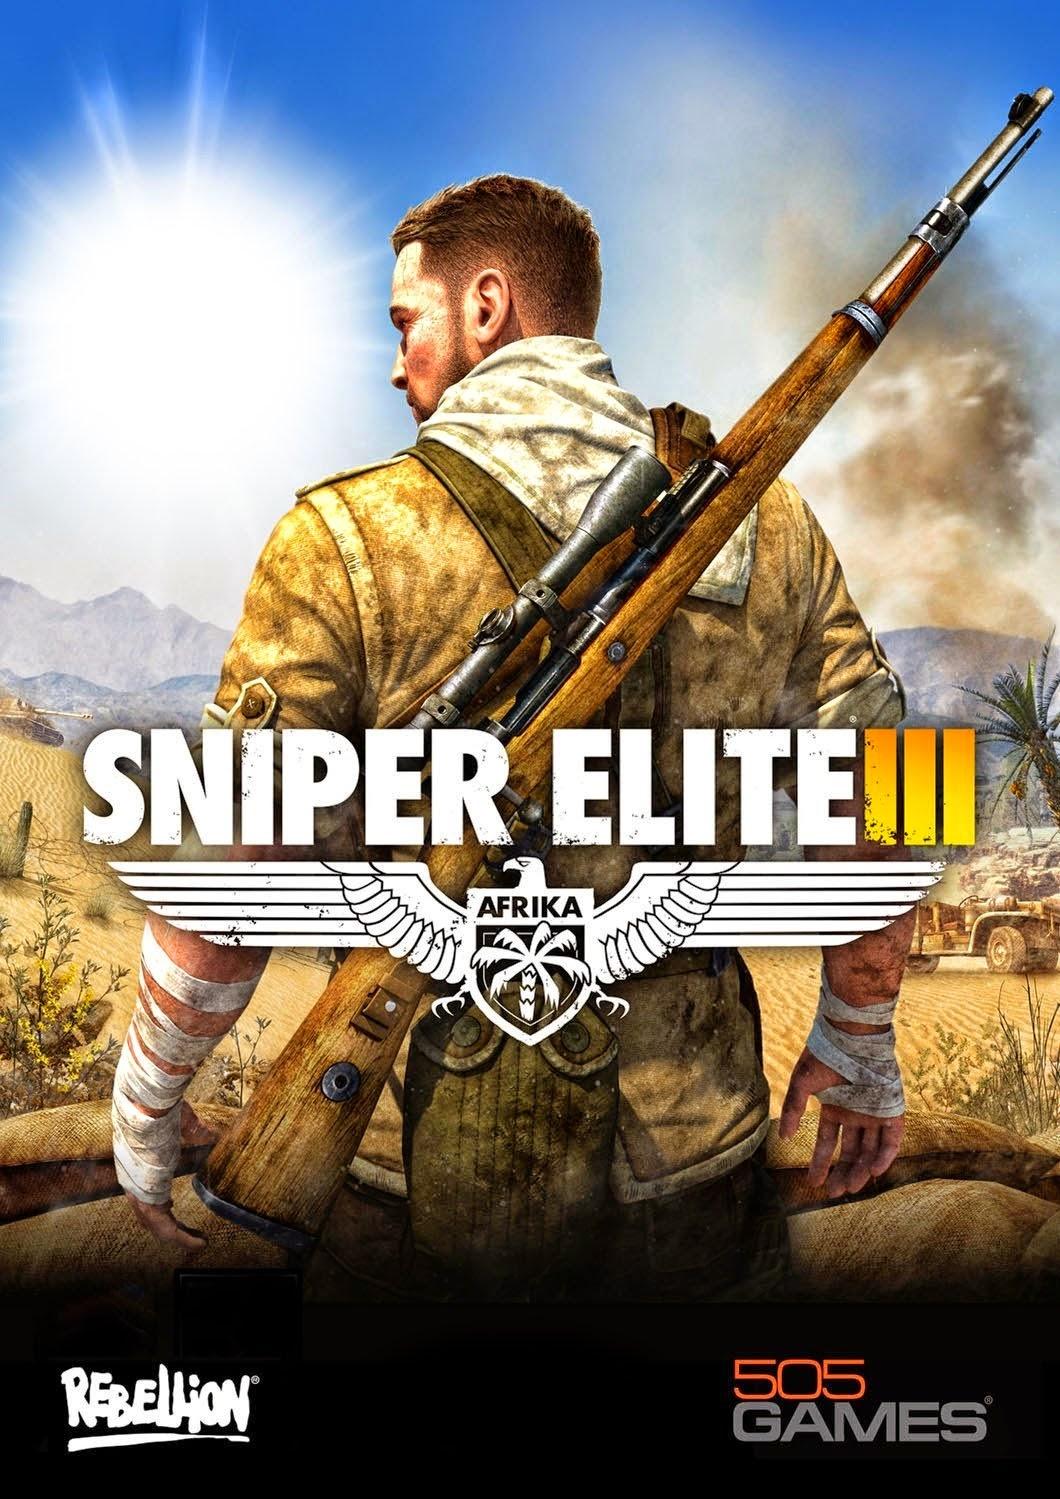 Siper Elite 3 Review